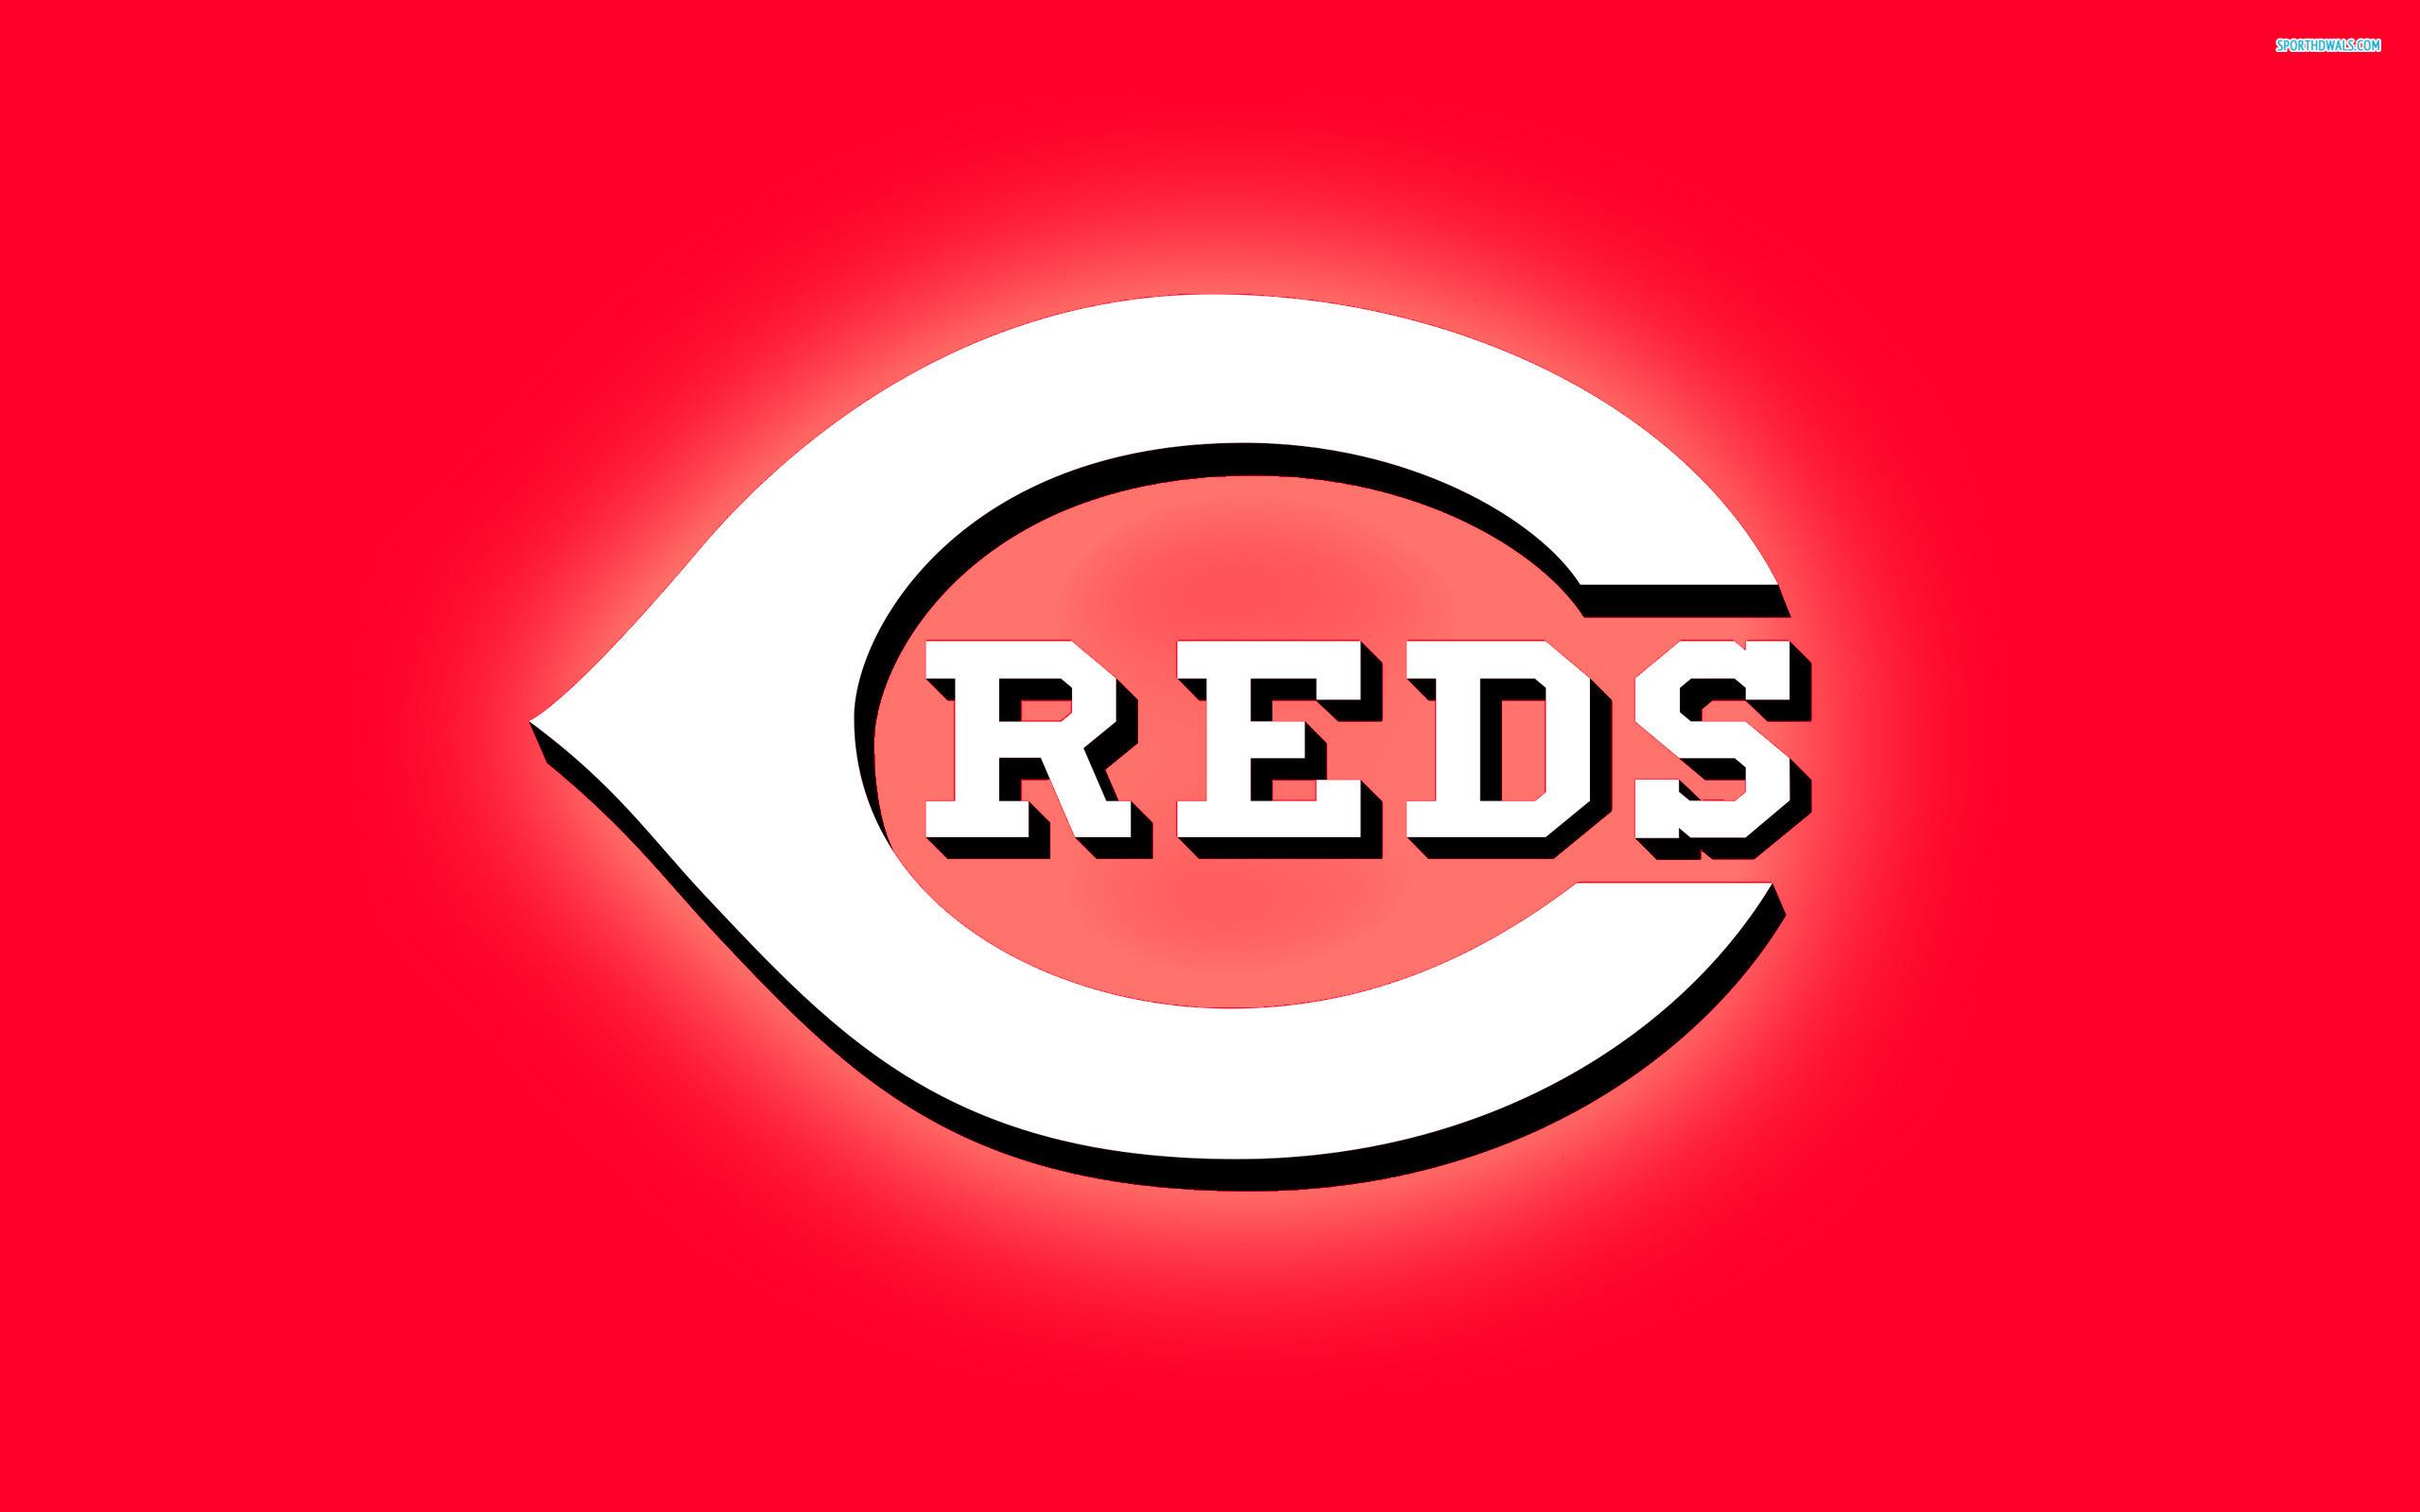 CINCINNATI REDS mlb baseball 4 wallpaper 2560x1600 229499 2560x1600